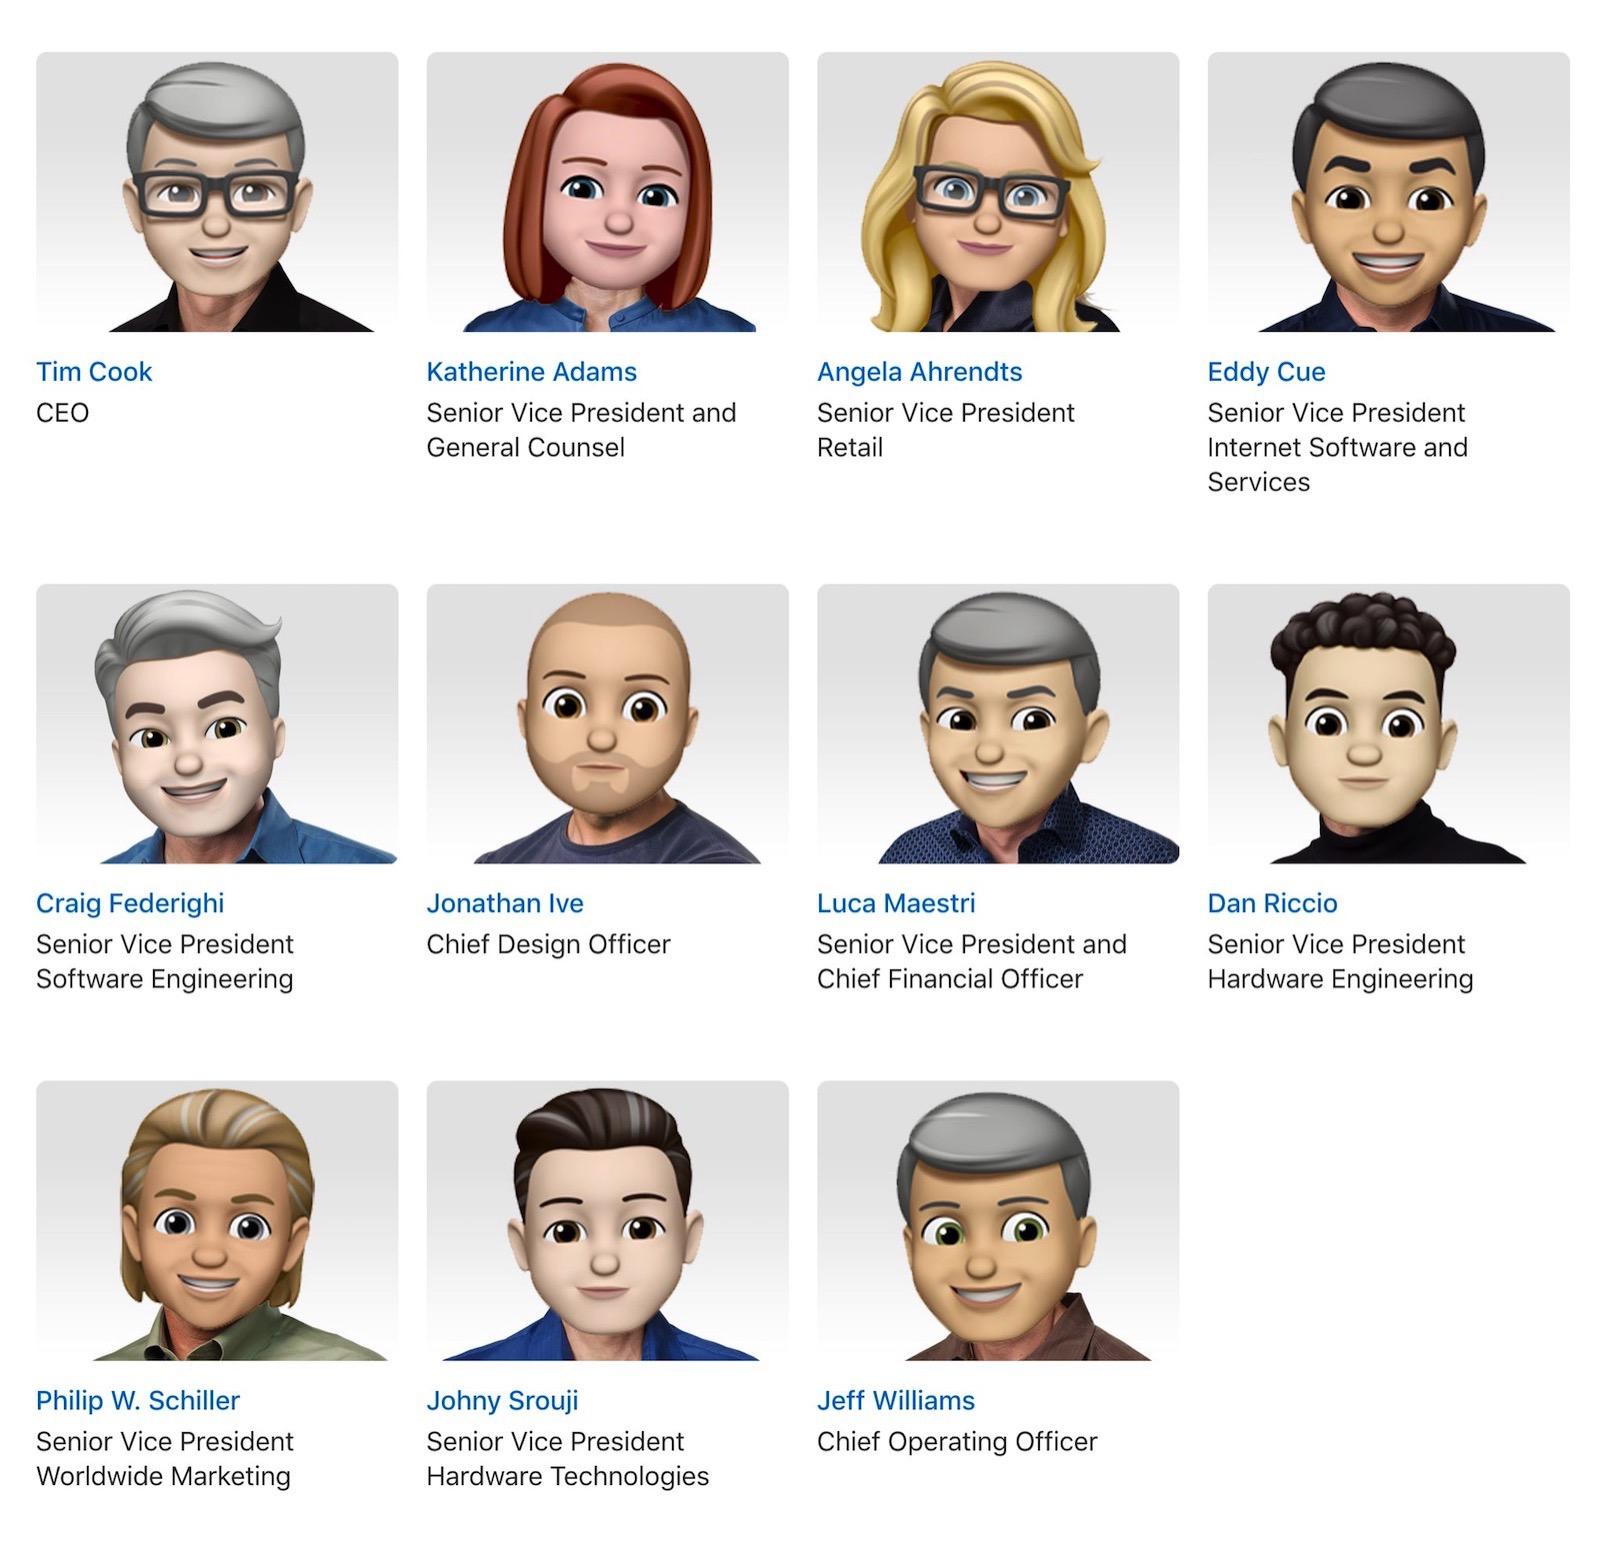 Executives-Profiles-in-Emoji-2.jpg